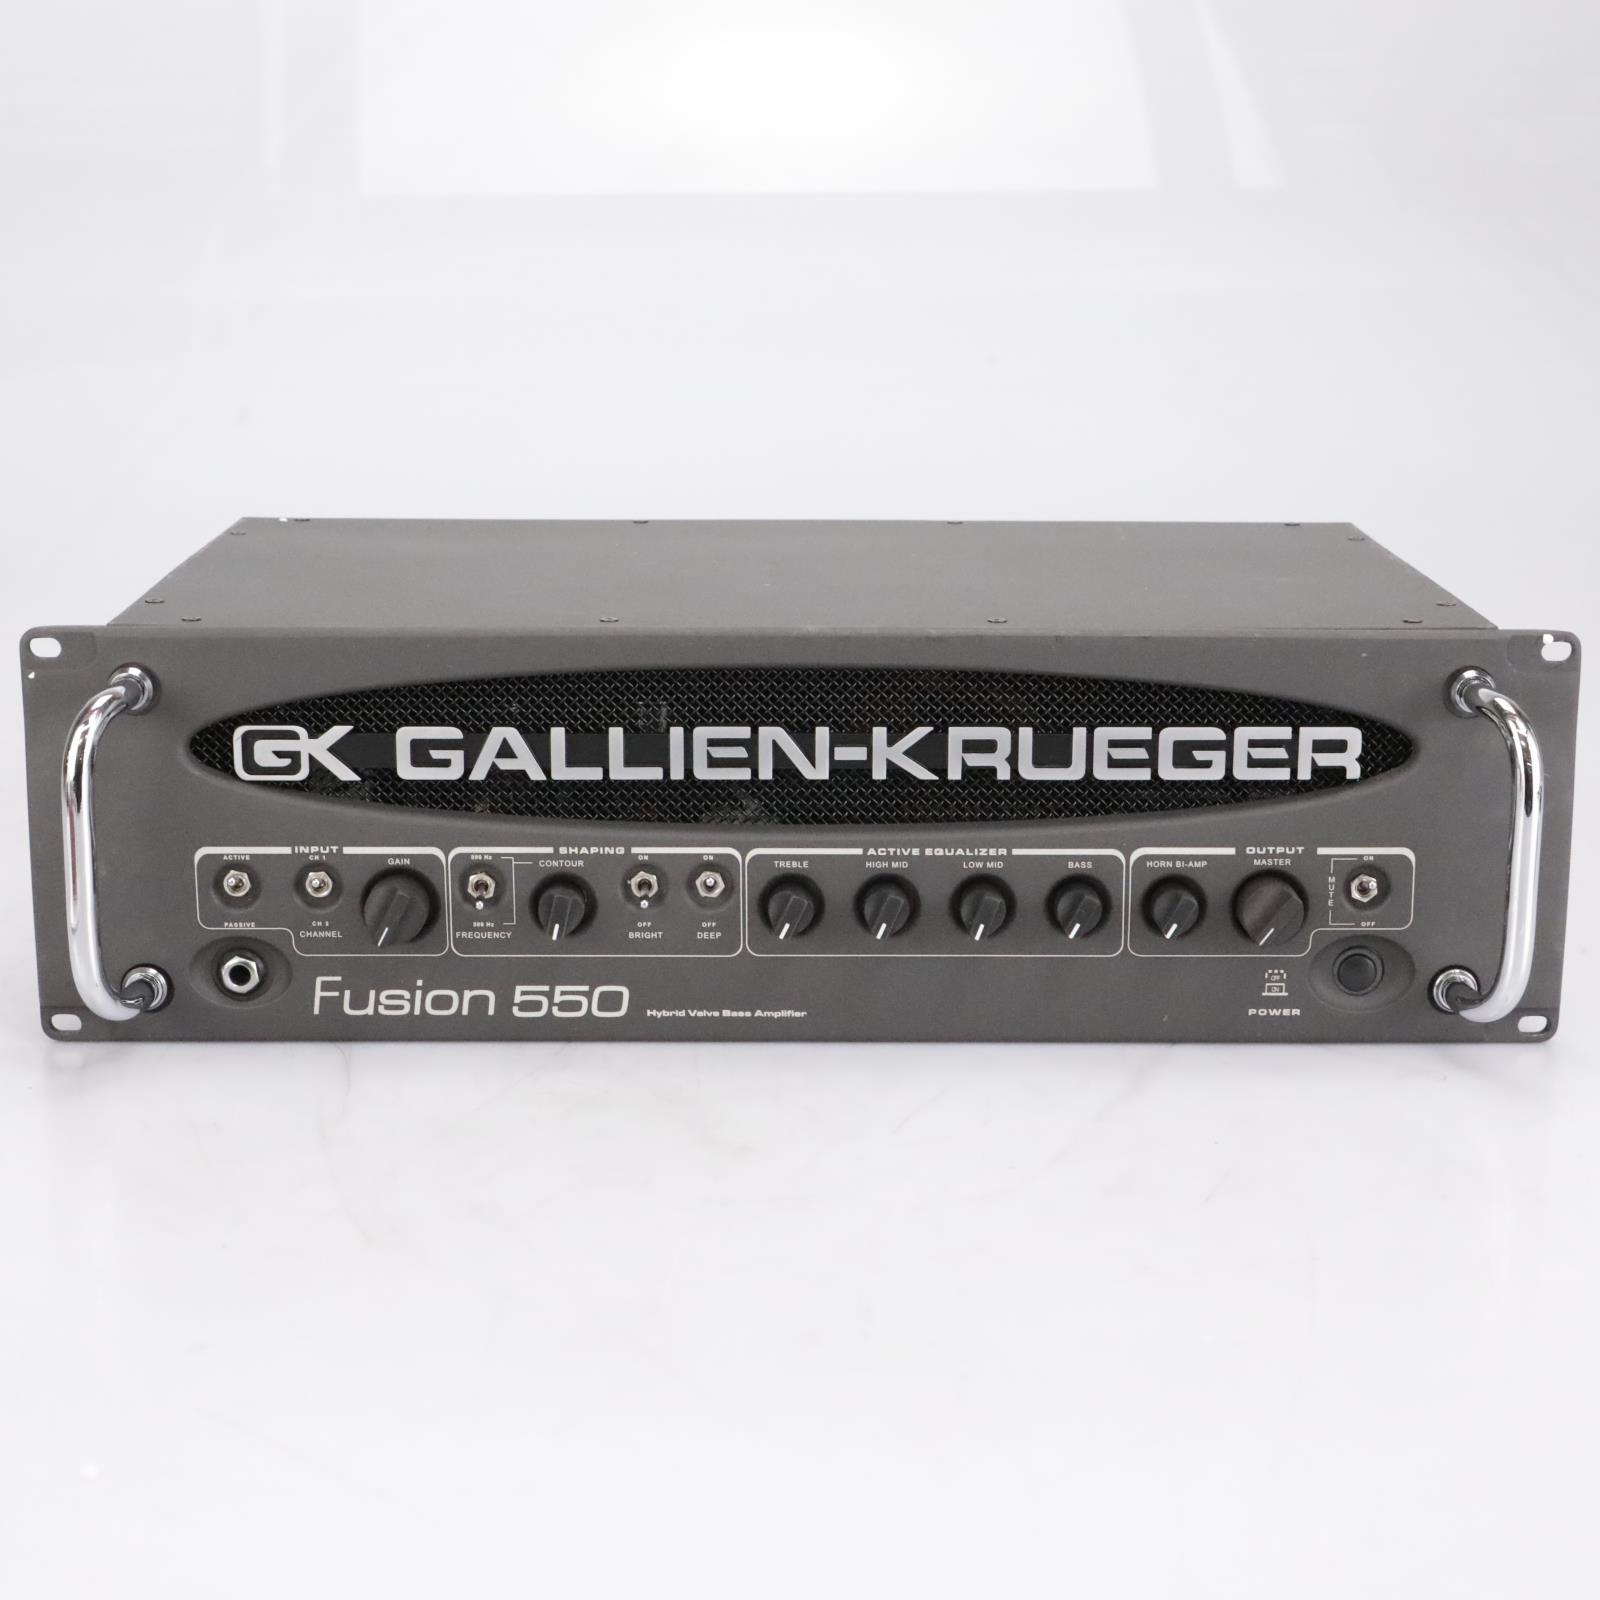 Gallien Krueger GK Fusion 550 Hybrid Tube Bass Amp Head w/Box #41923